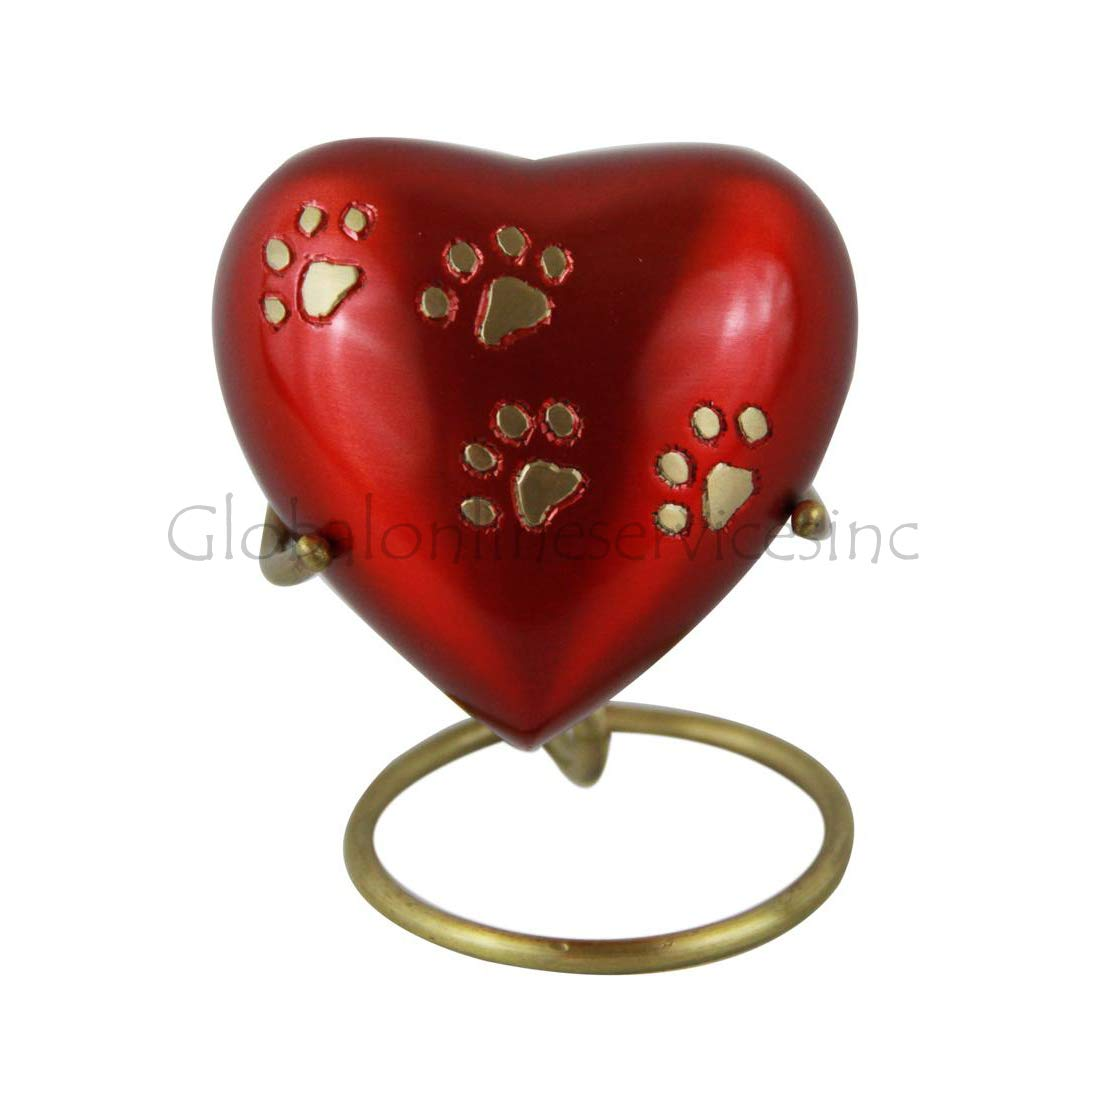 Pet Memorial Keepsake Urn UK Red Heart Small Brass Cremation Urn Ashes UK